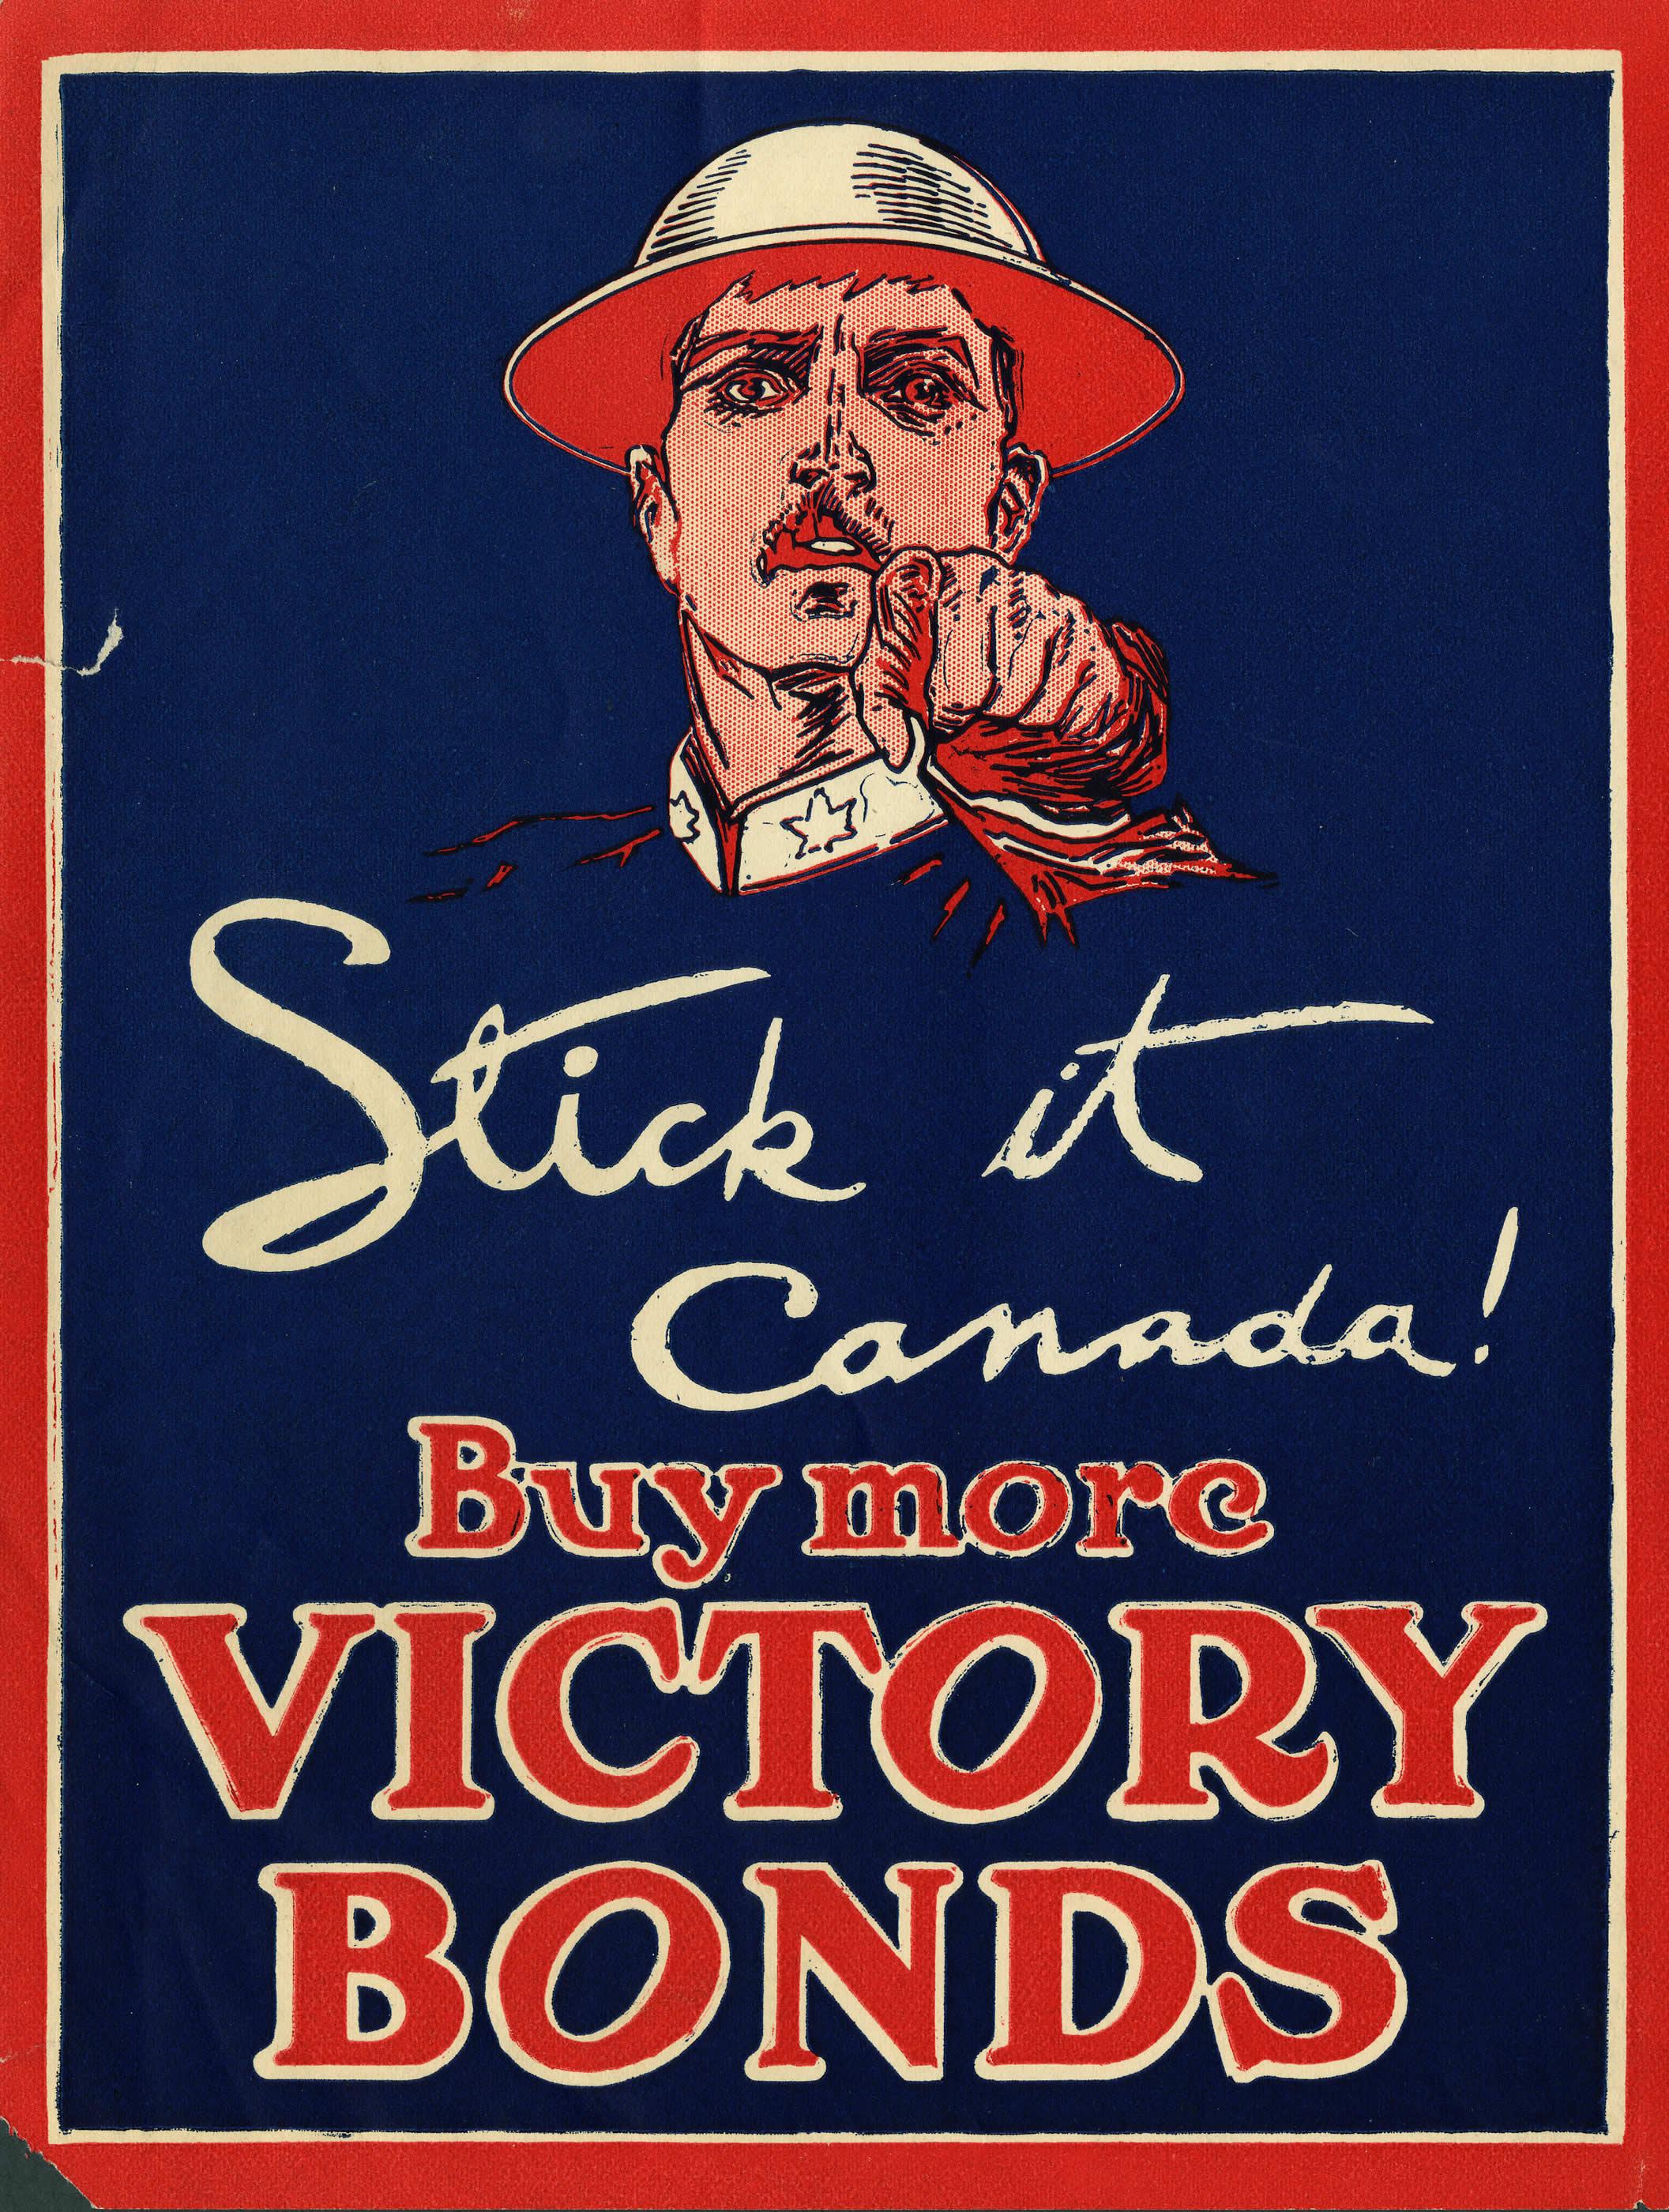 <i>Stick it Canada!</i>